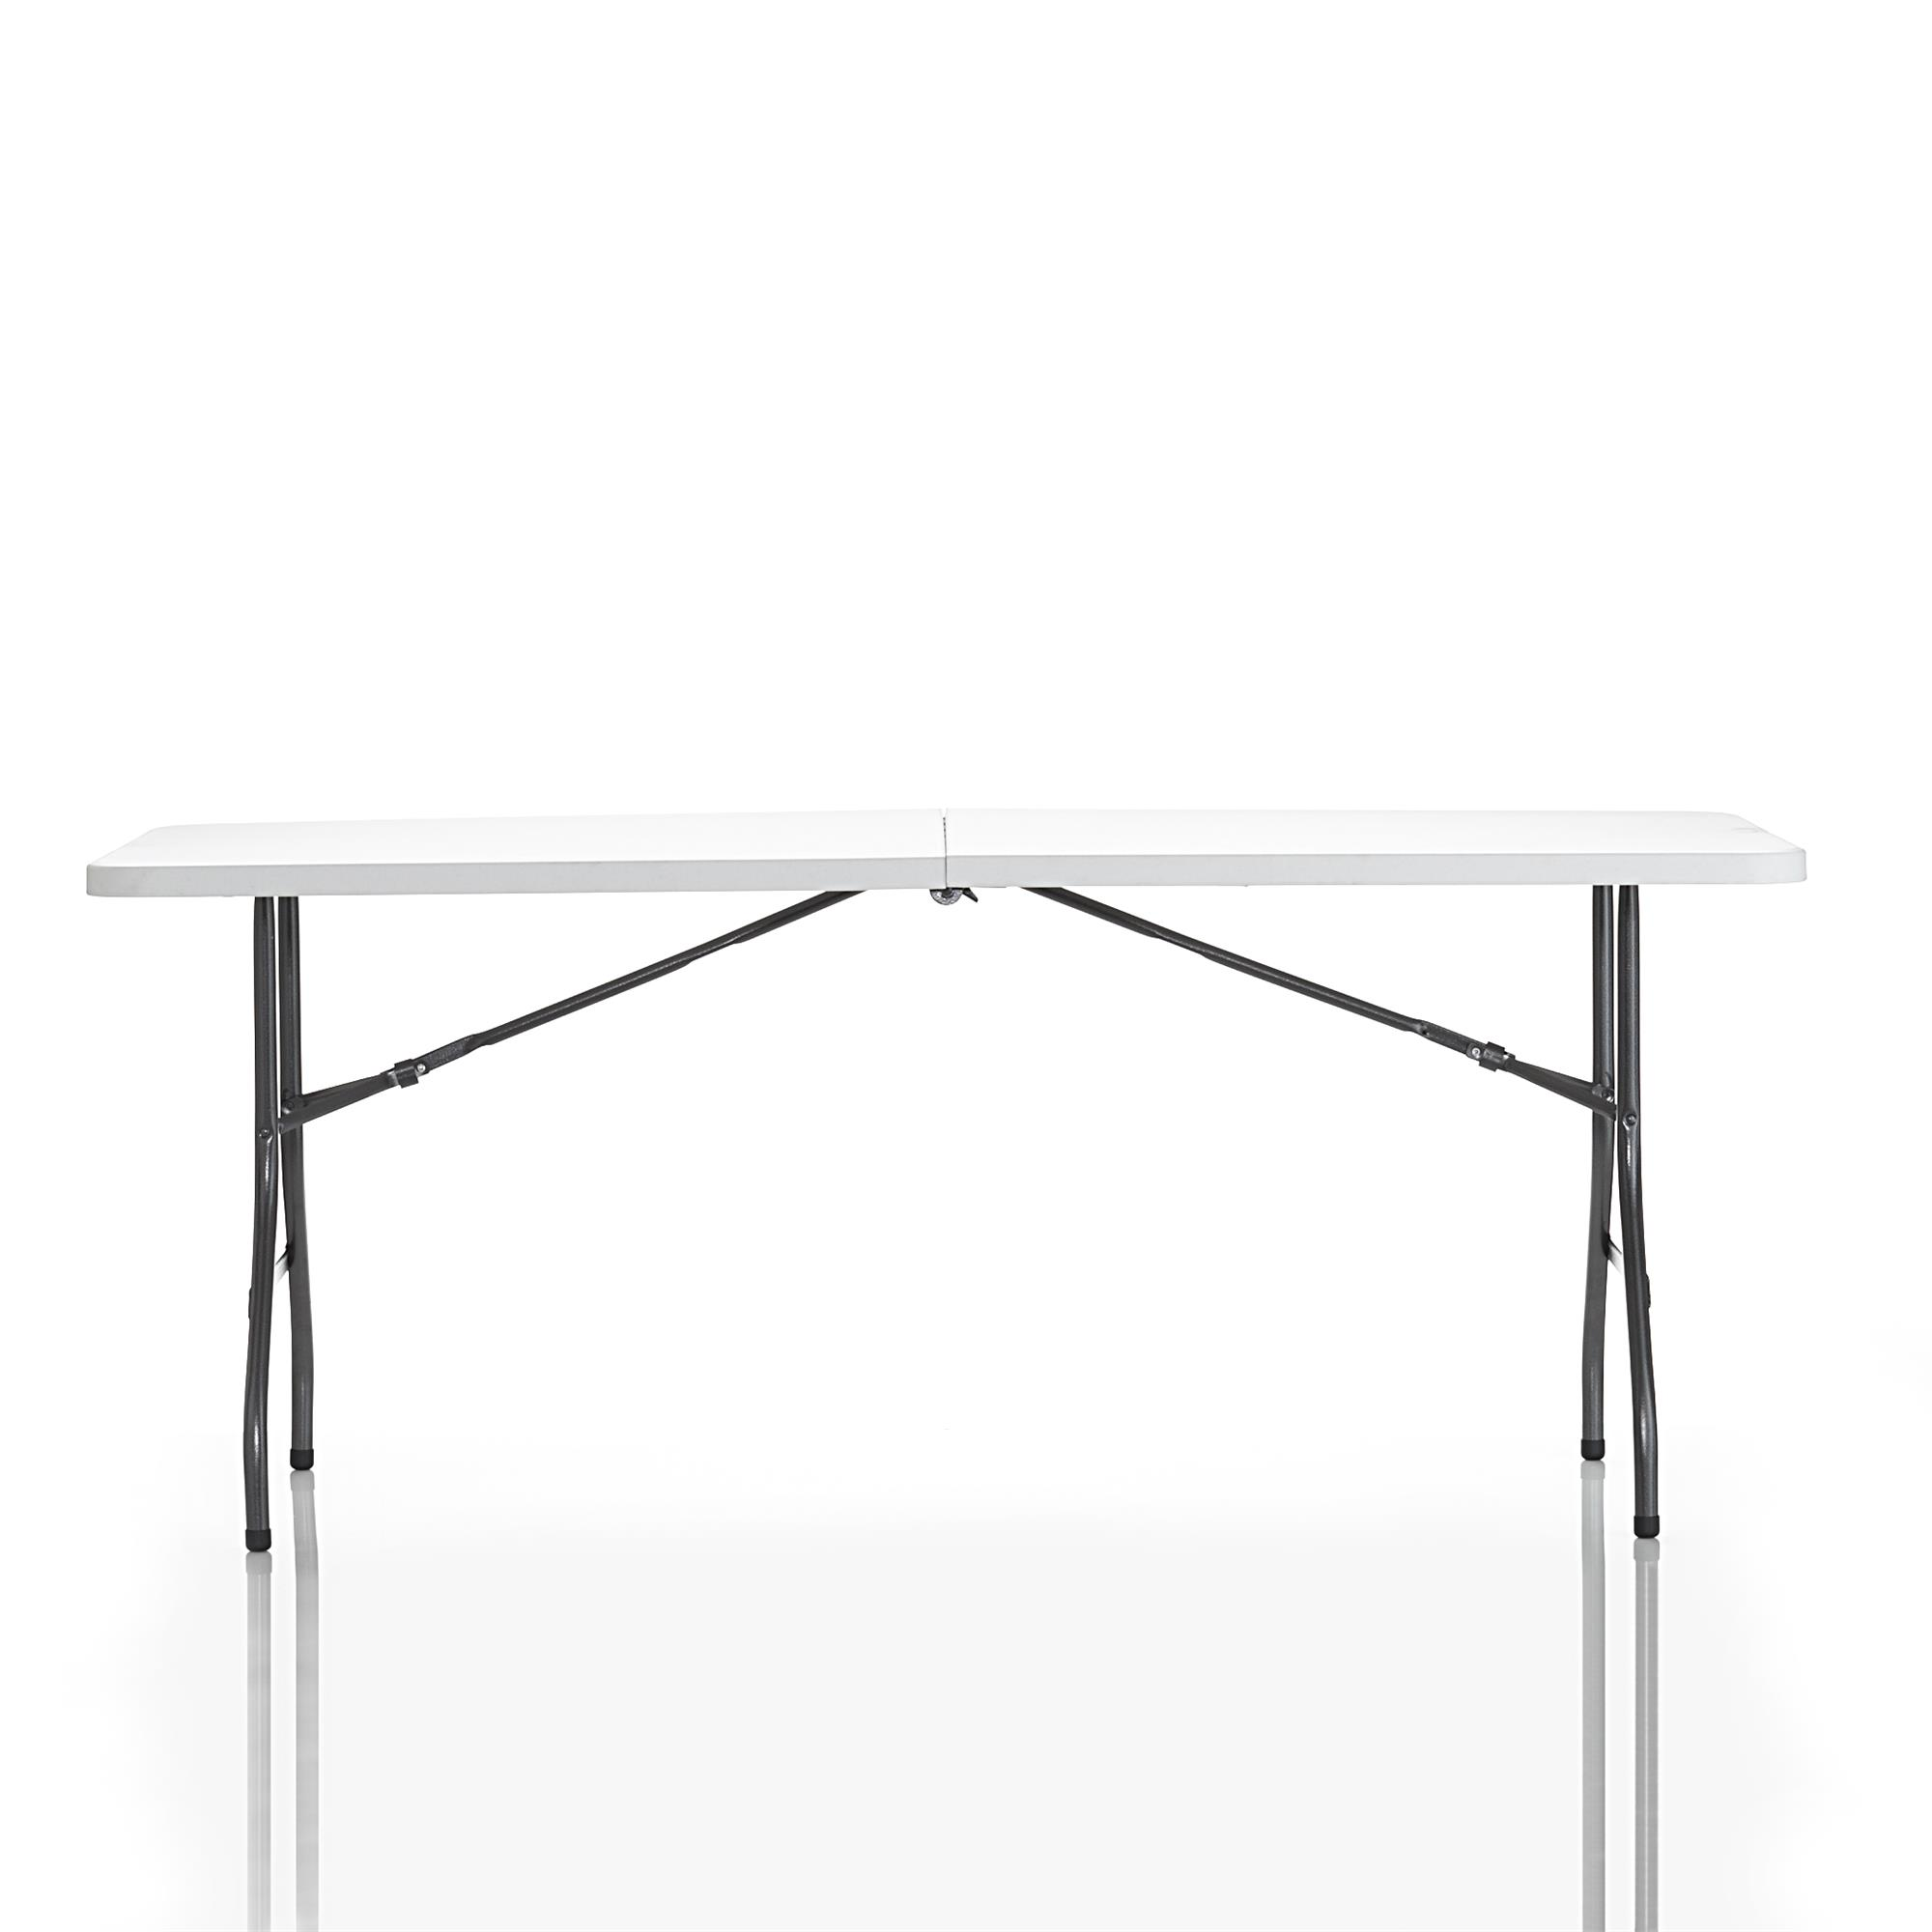 Cosco 2 Pack 6 Foot Centerfold Folding Table White Walmart Com Walmart Com